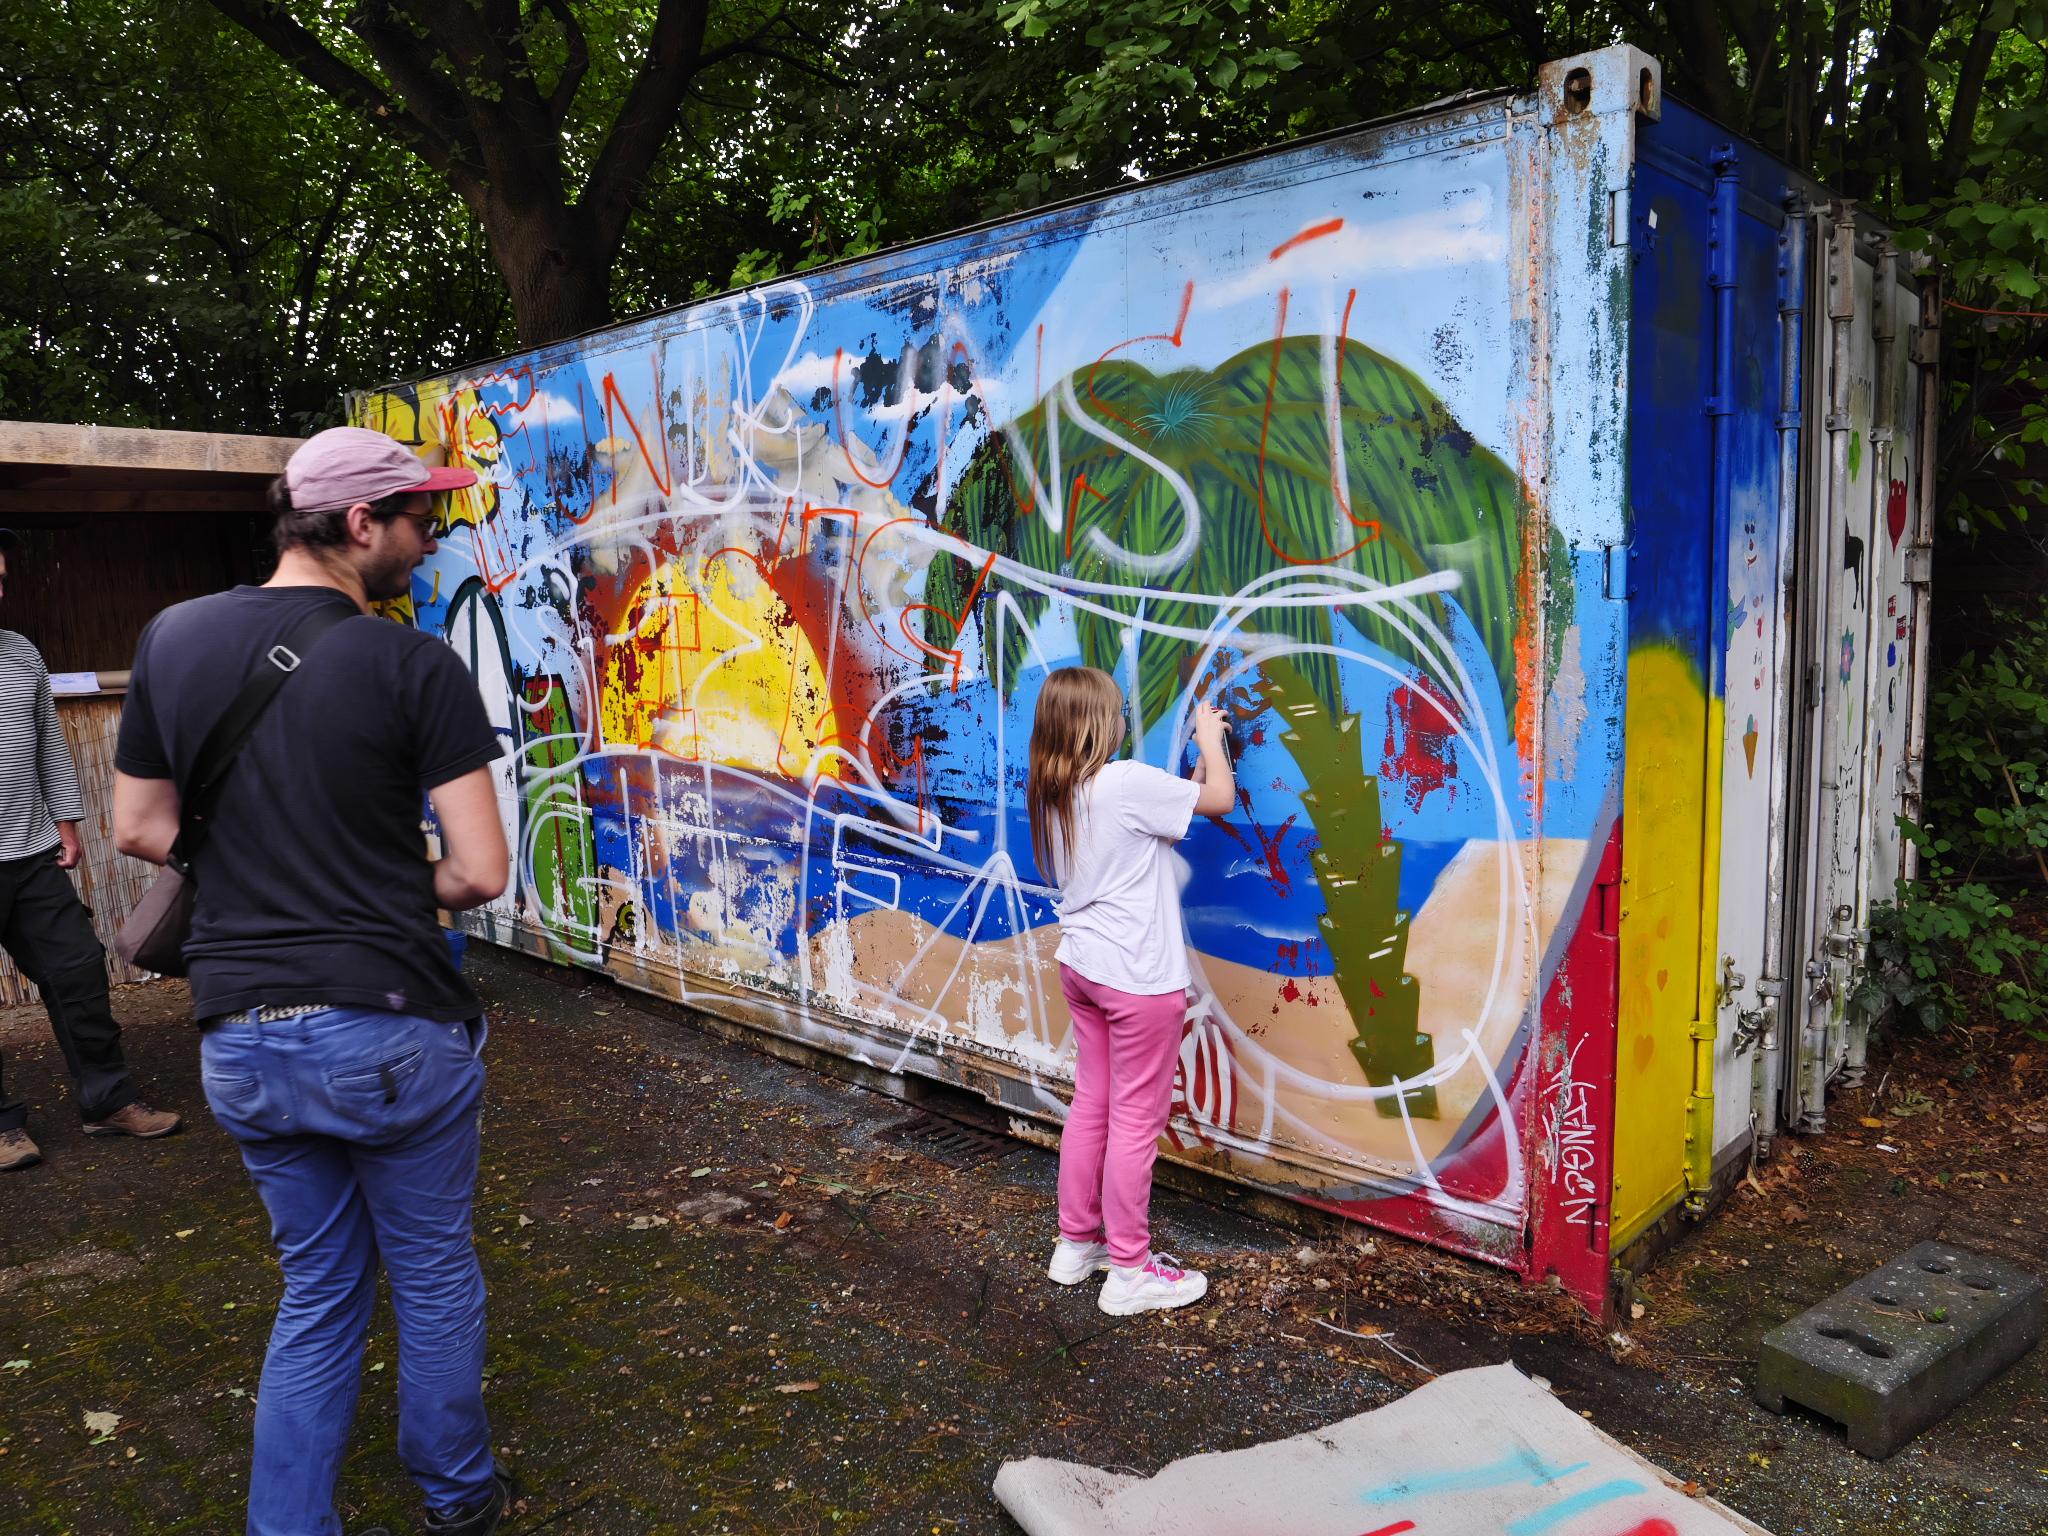 jugendkulturjahr-2020-ratingen-jkj2020-Graffitiworksjop-Bild07